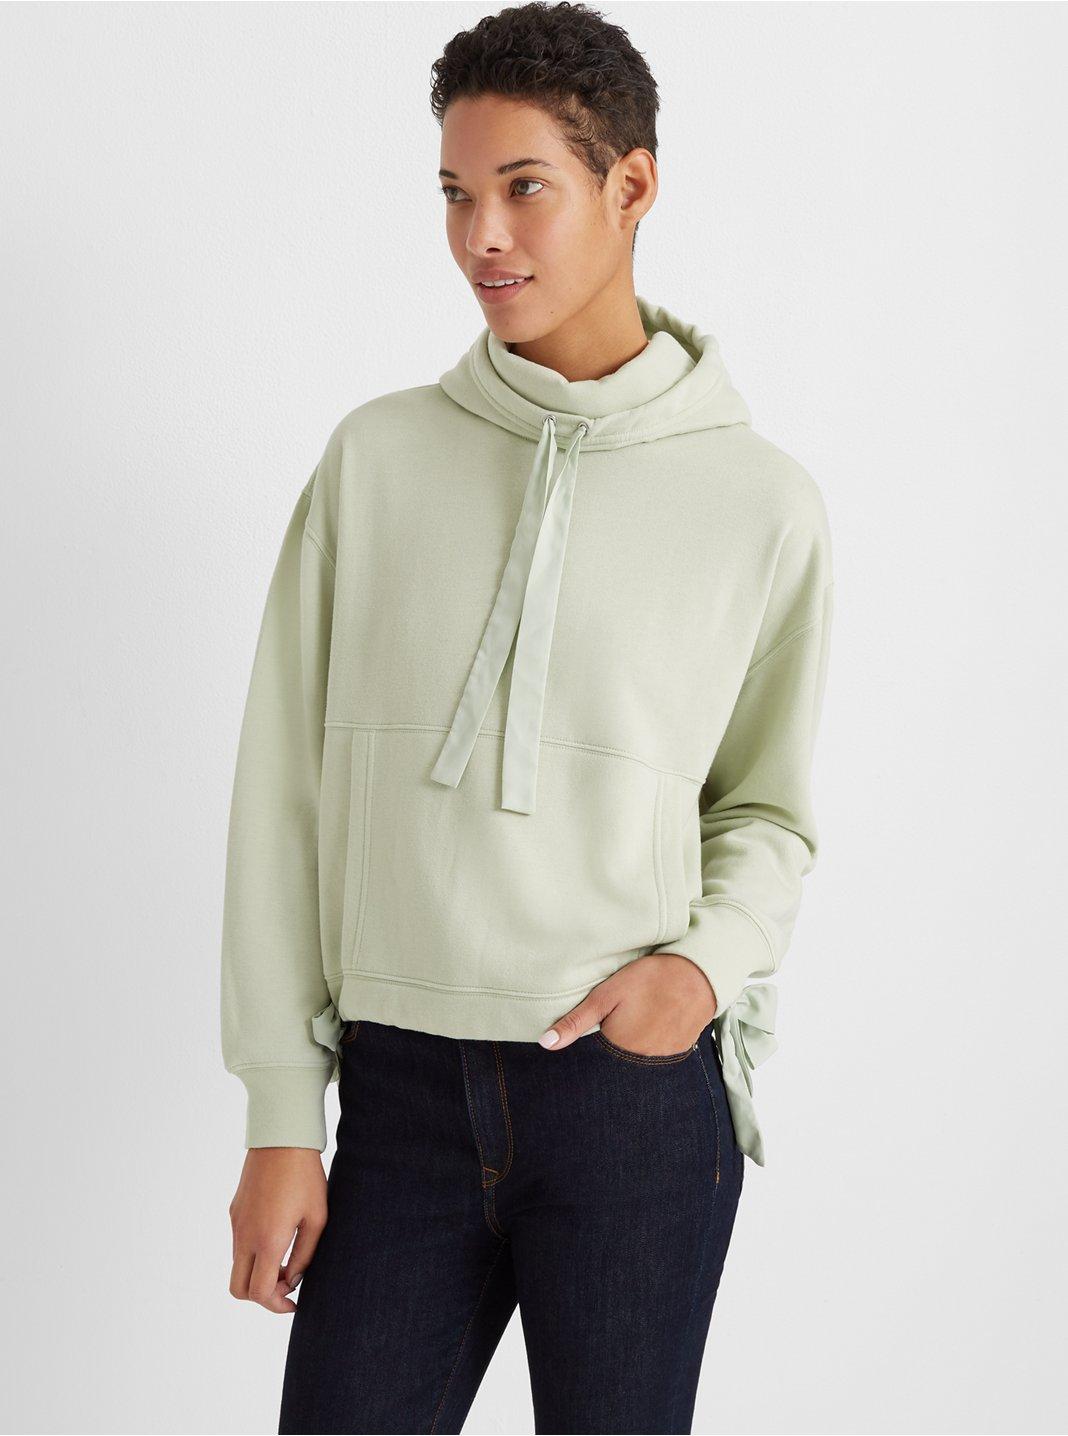 Harvee Sweatshirt